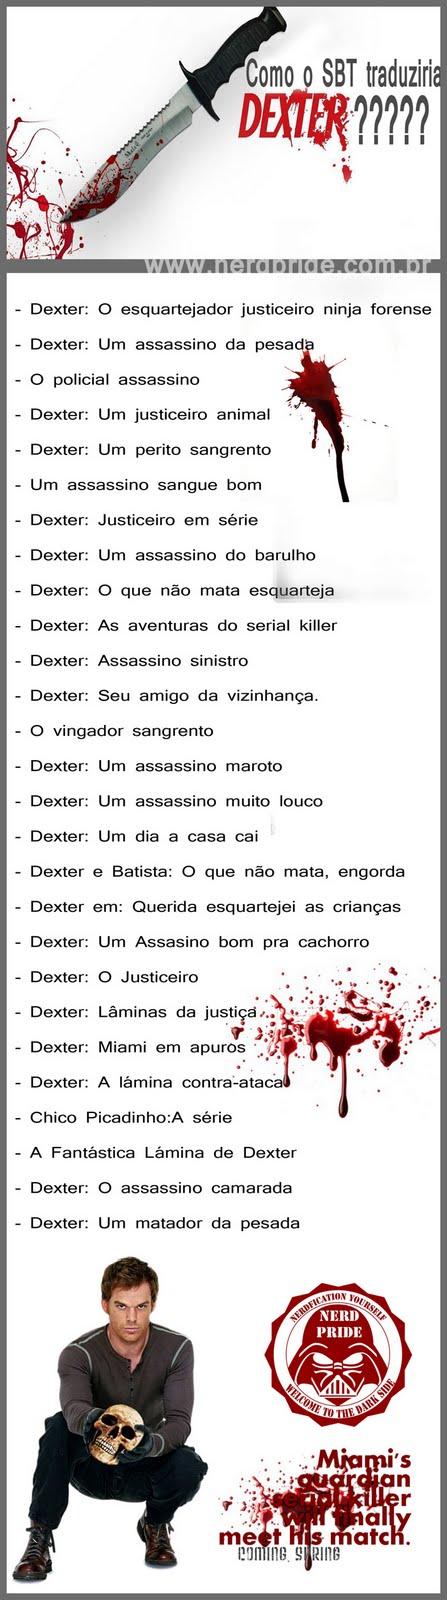 Dexter-SBT-2.jpg